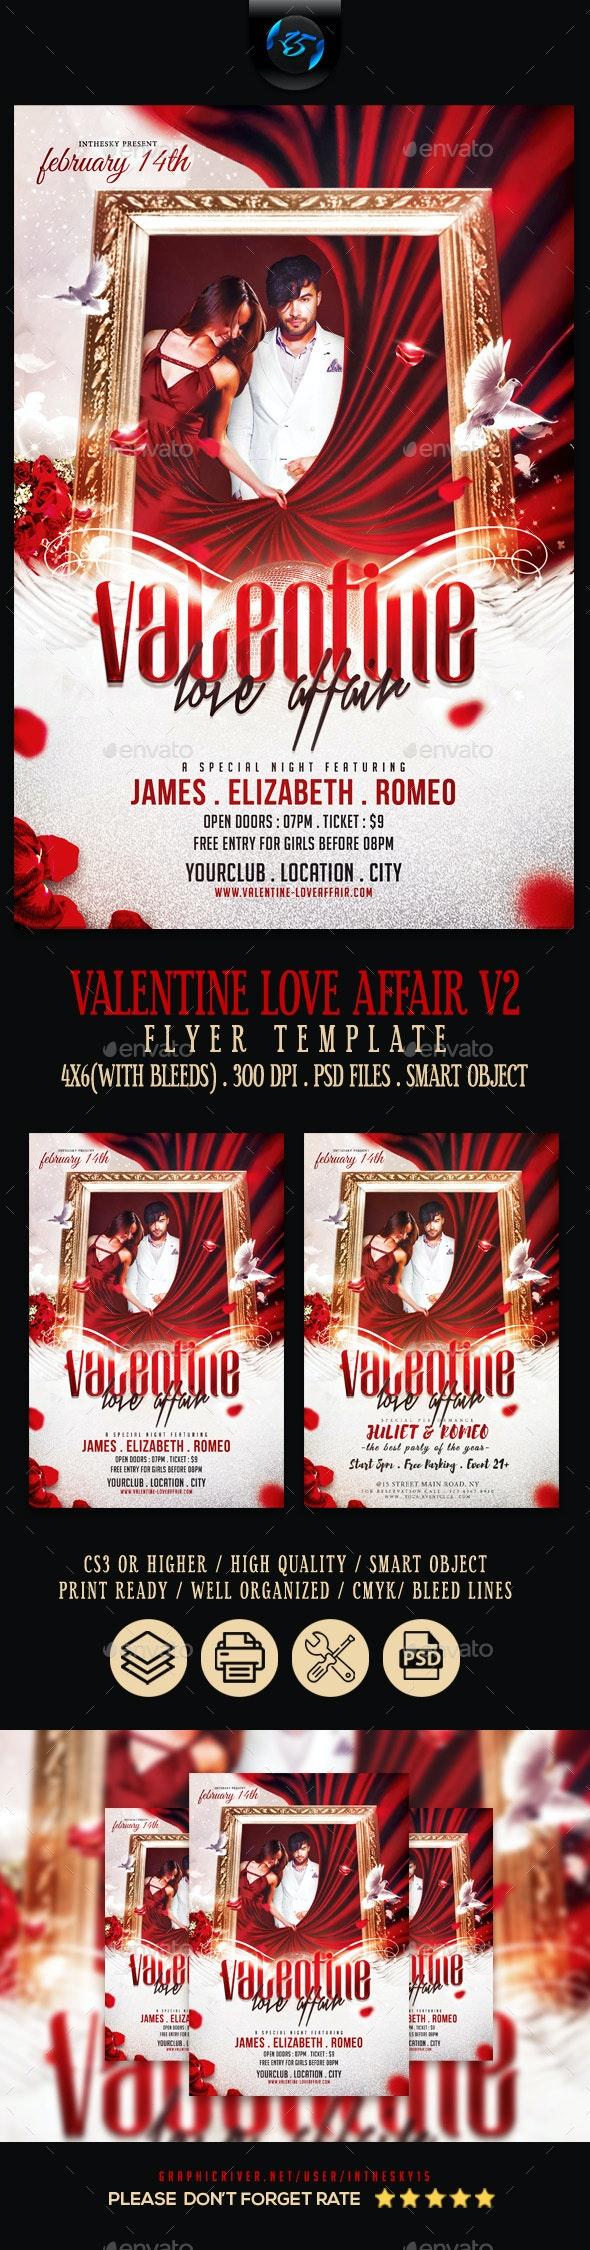 Valentine Love Affair V2 Flyer Template - Flyers Print Templates